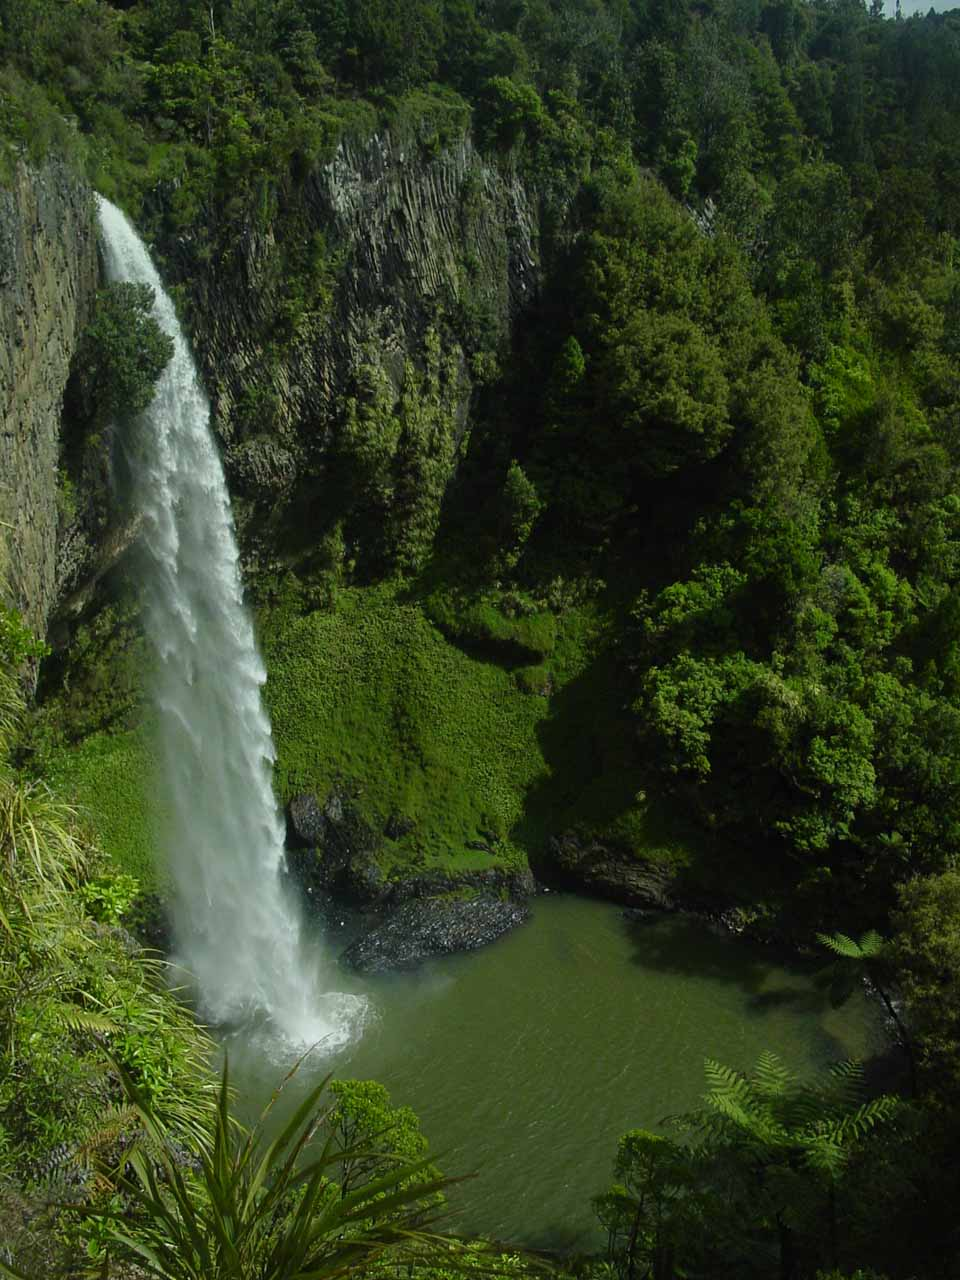 9. BRIDAL VEIL FALLS (WAIREINGA) [near Raglan, Waikato]